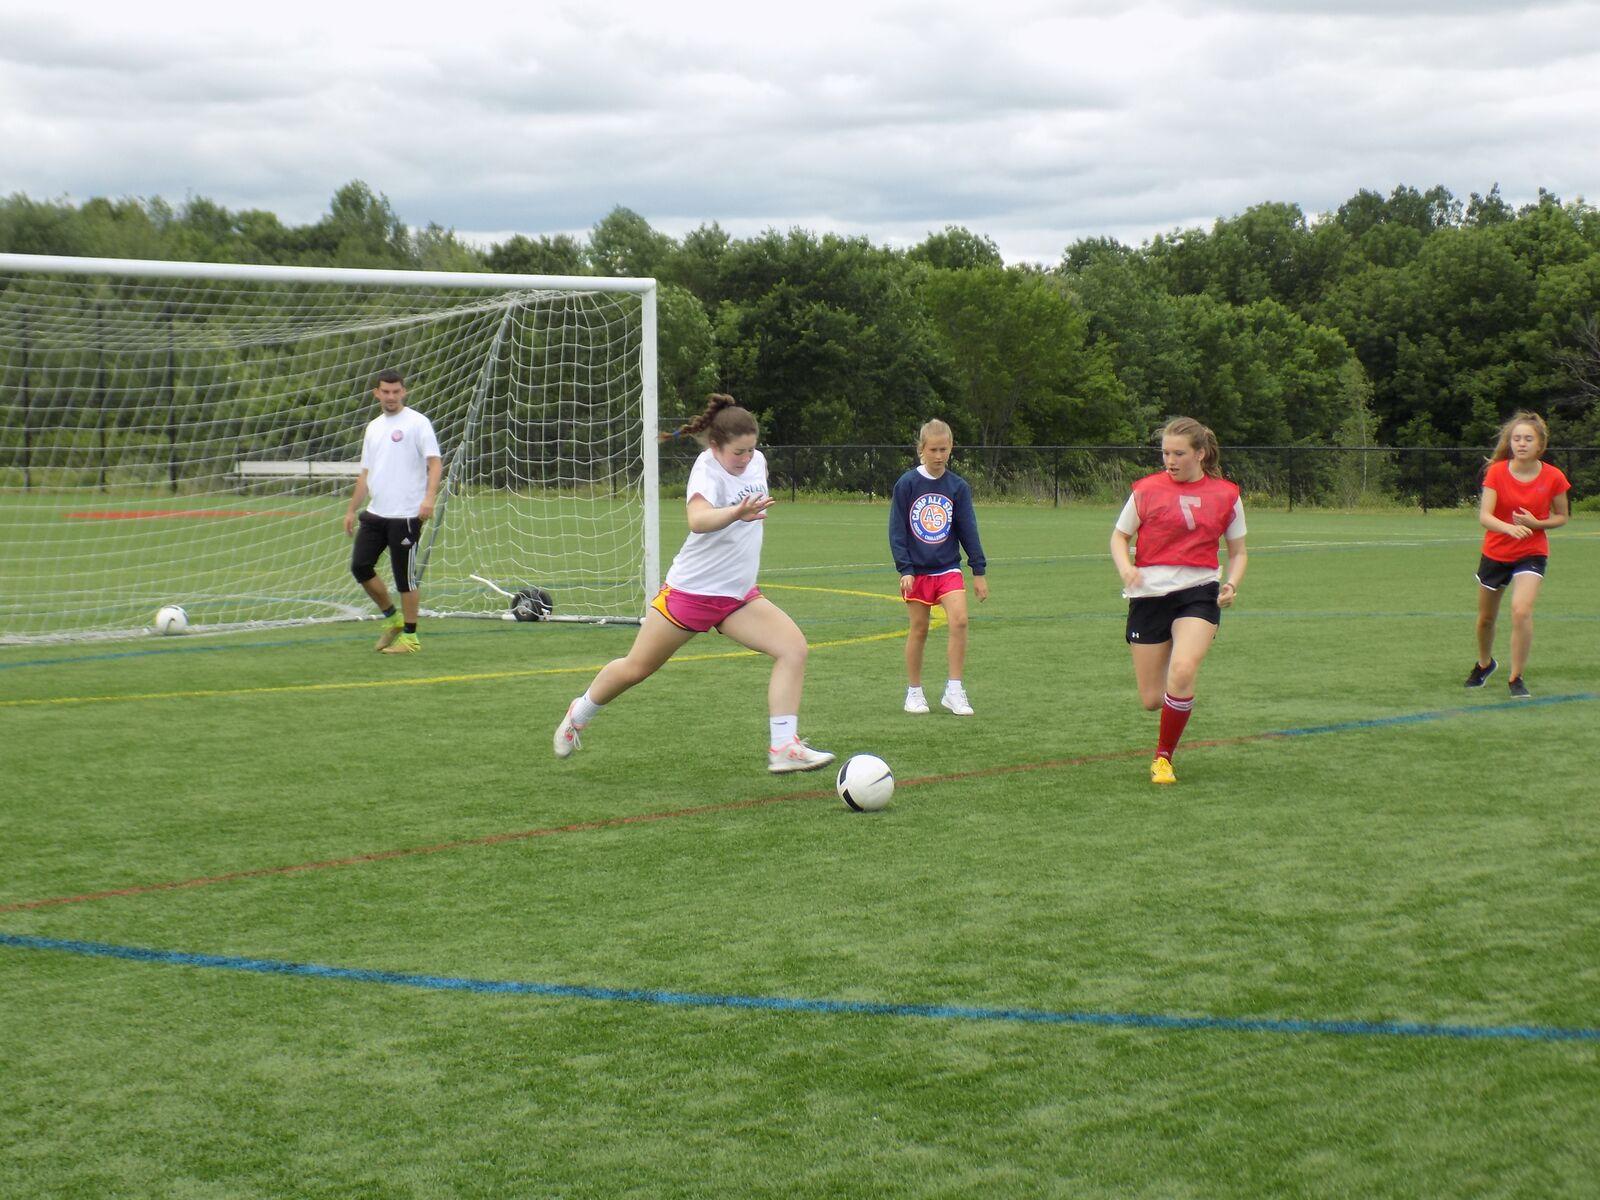 Nike Soccer Camp at Berkshire School